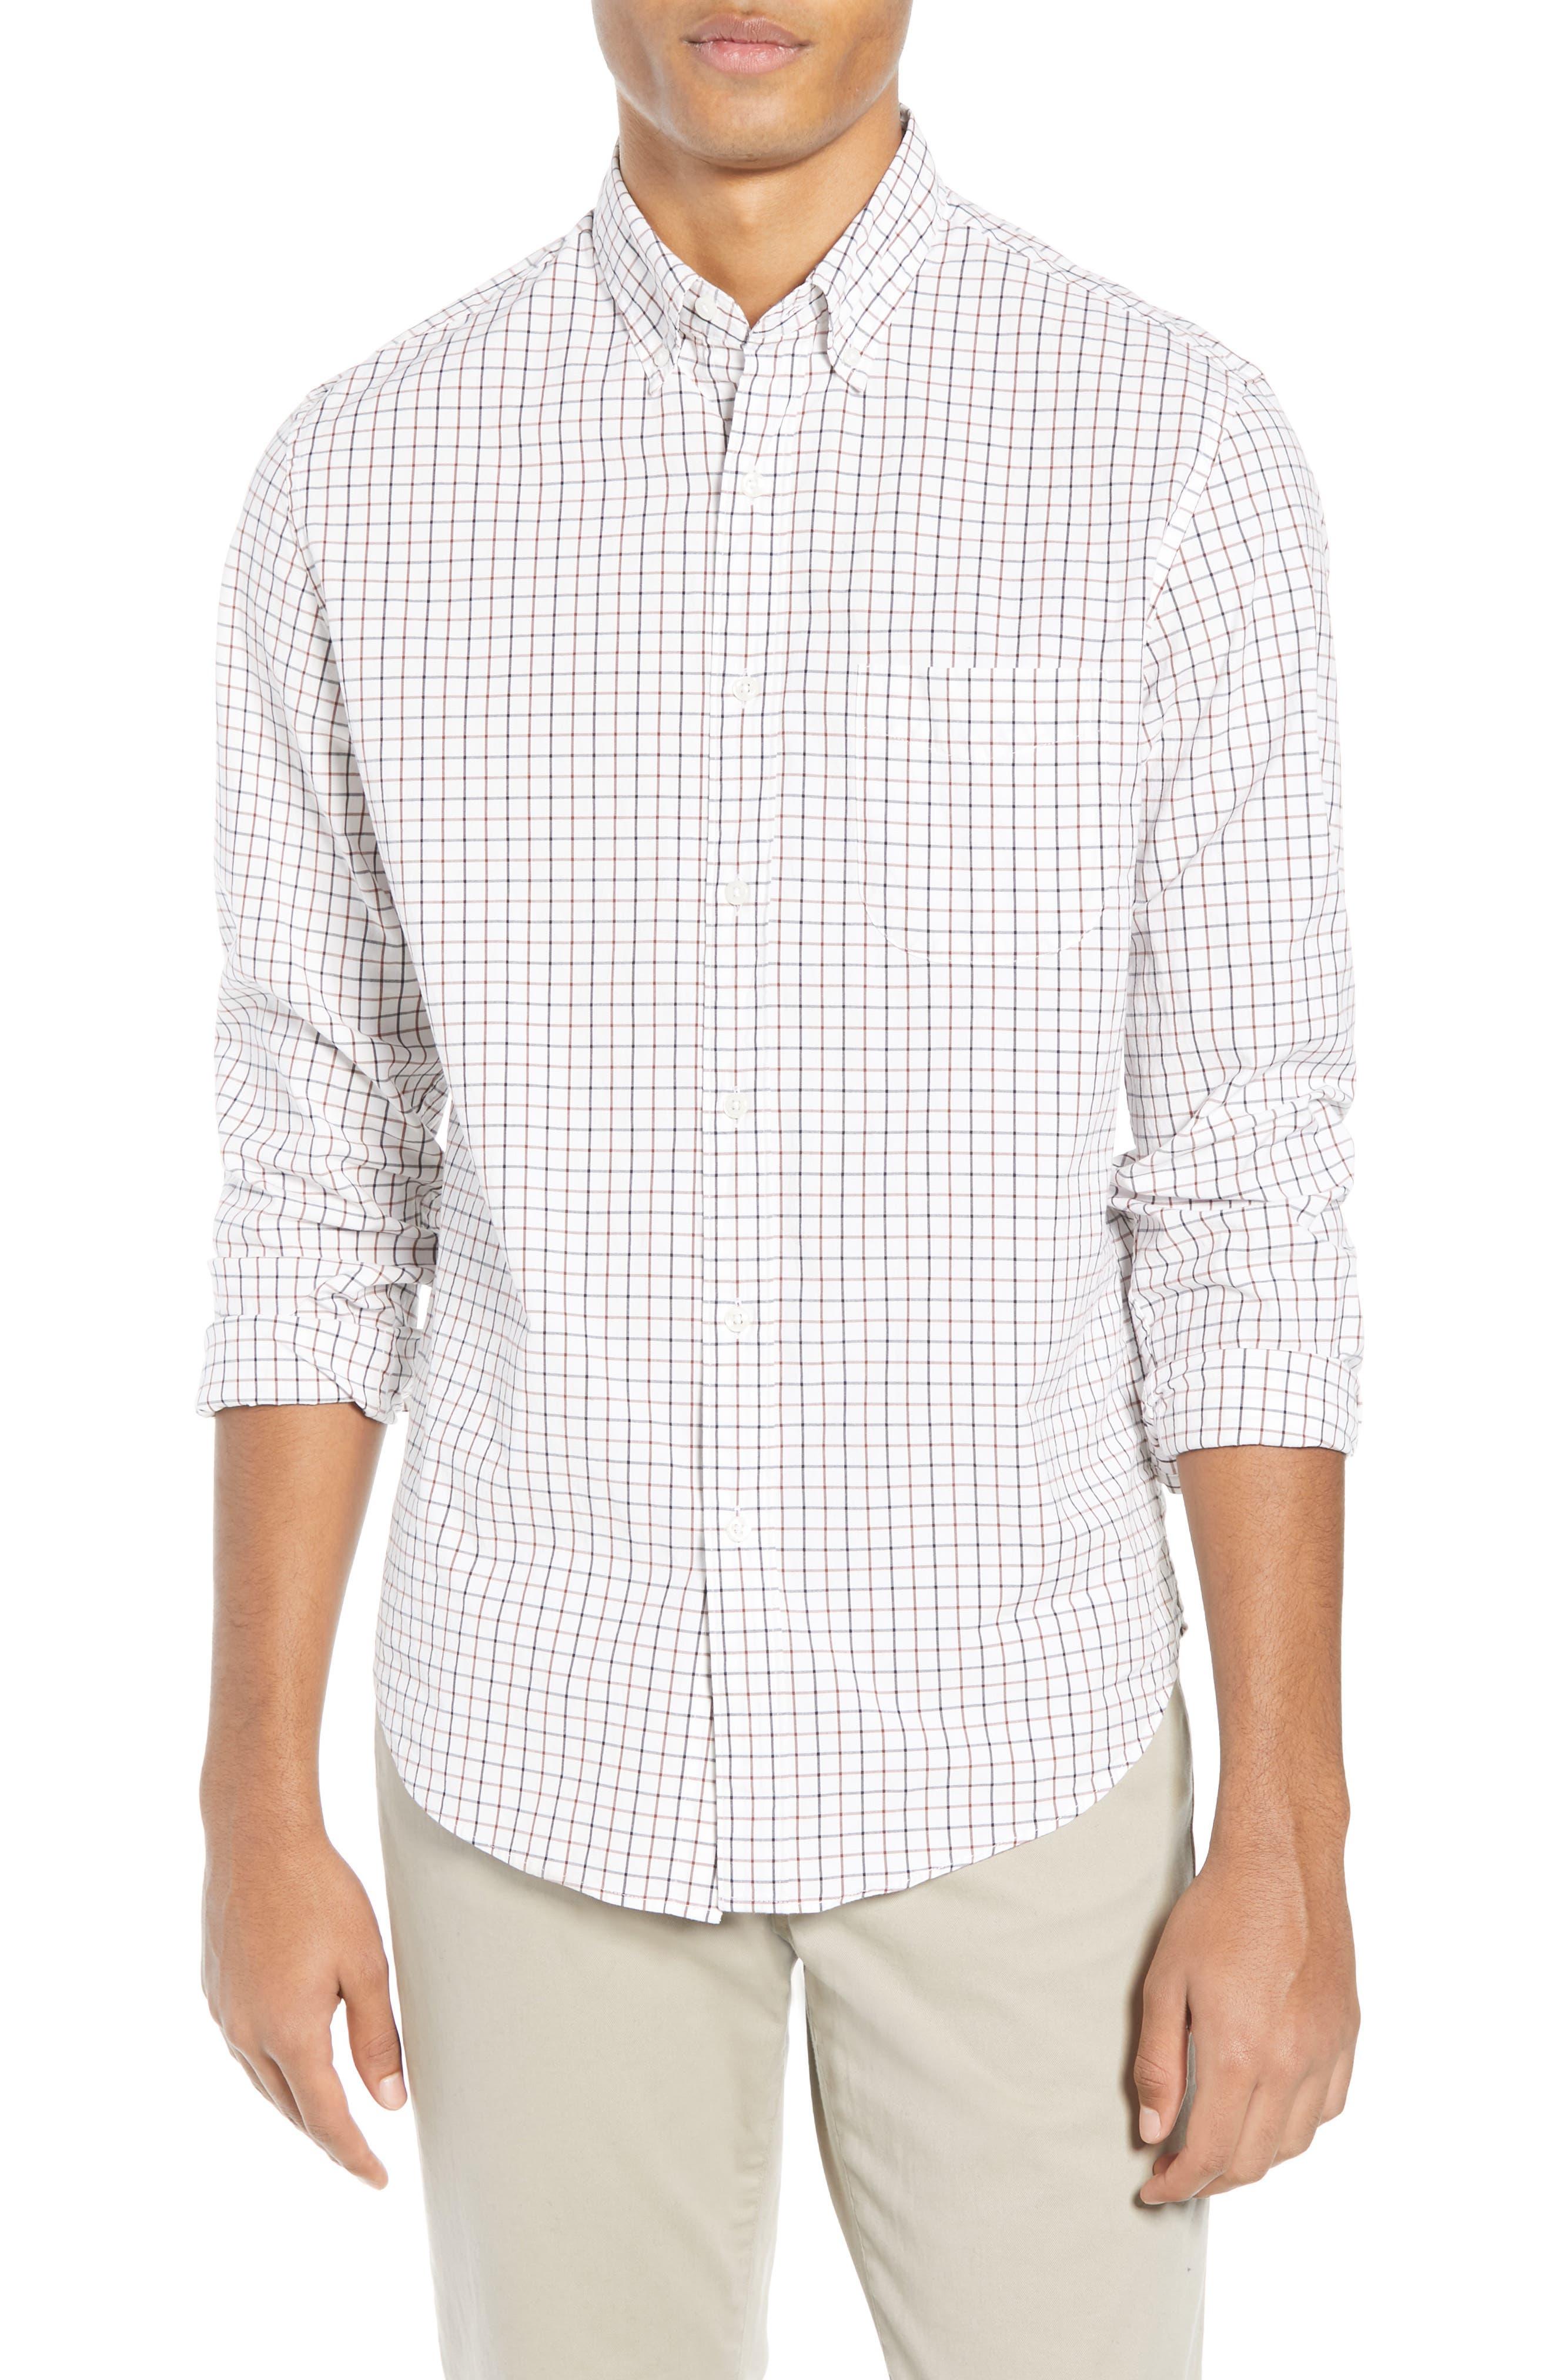 Slim Fit Stretch Secret Wash Stripe Tattersall Sport Shirt,                             Main thumbnail 1, color,                             NAVY MAHOGANY